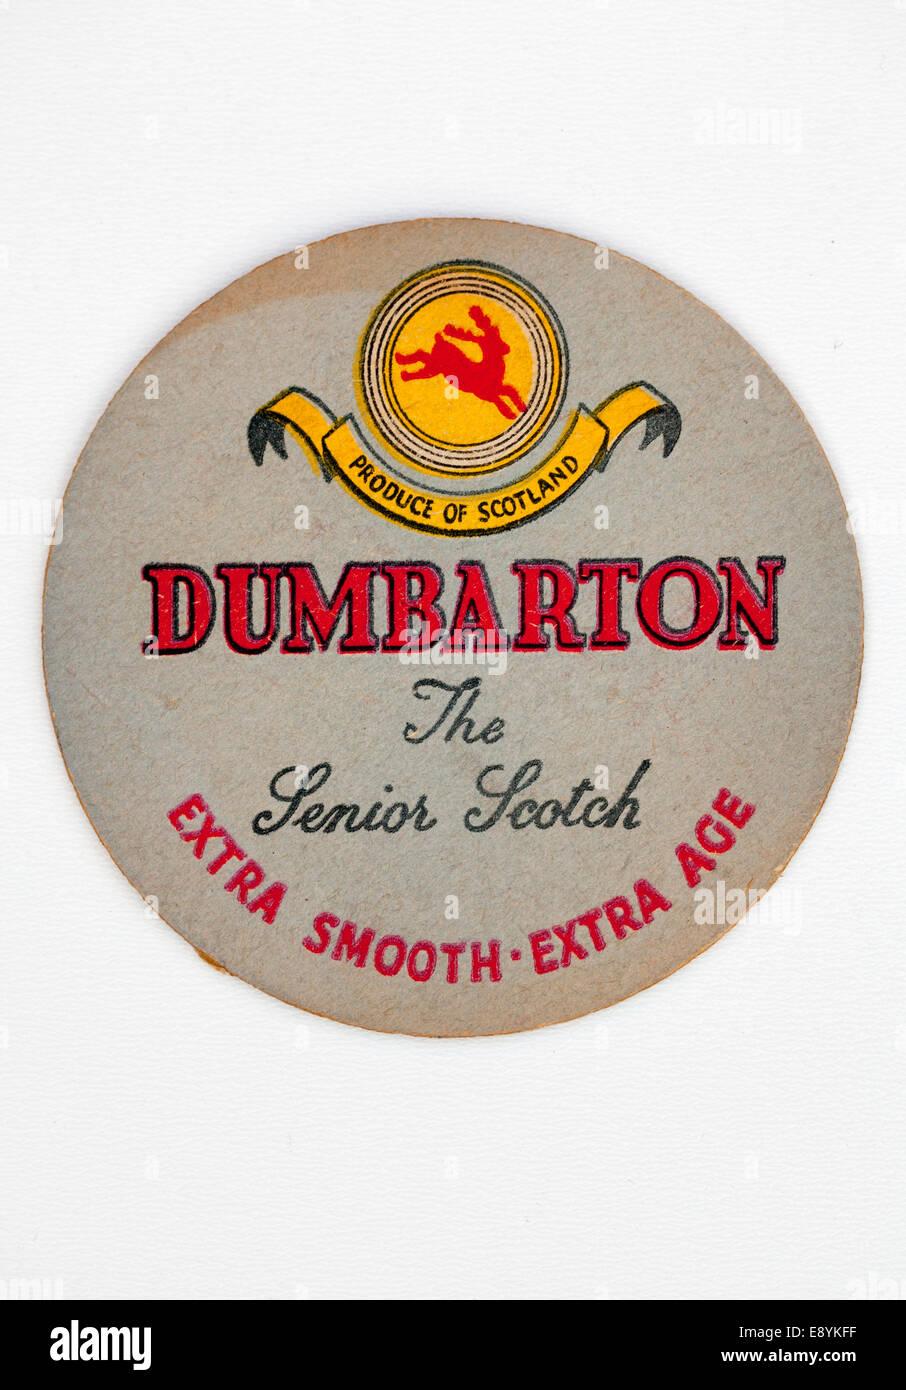 Vintage Old British Beer Mat advertising Dumbarton Whisky - Stock Image